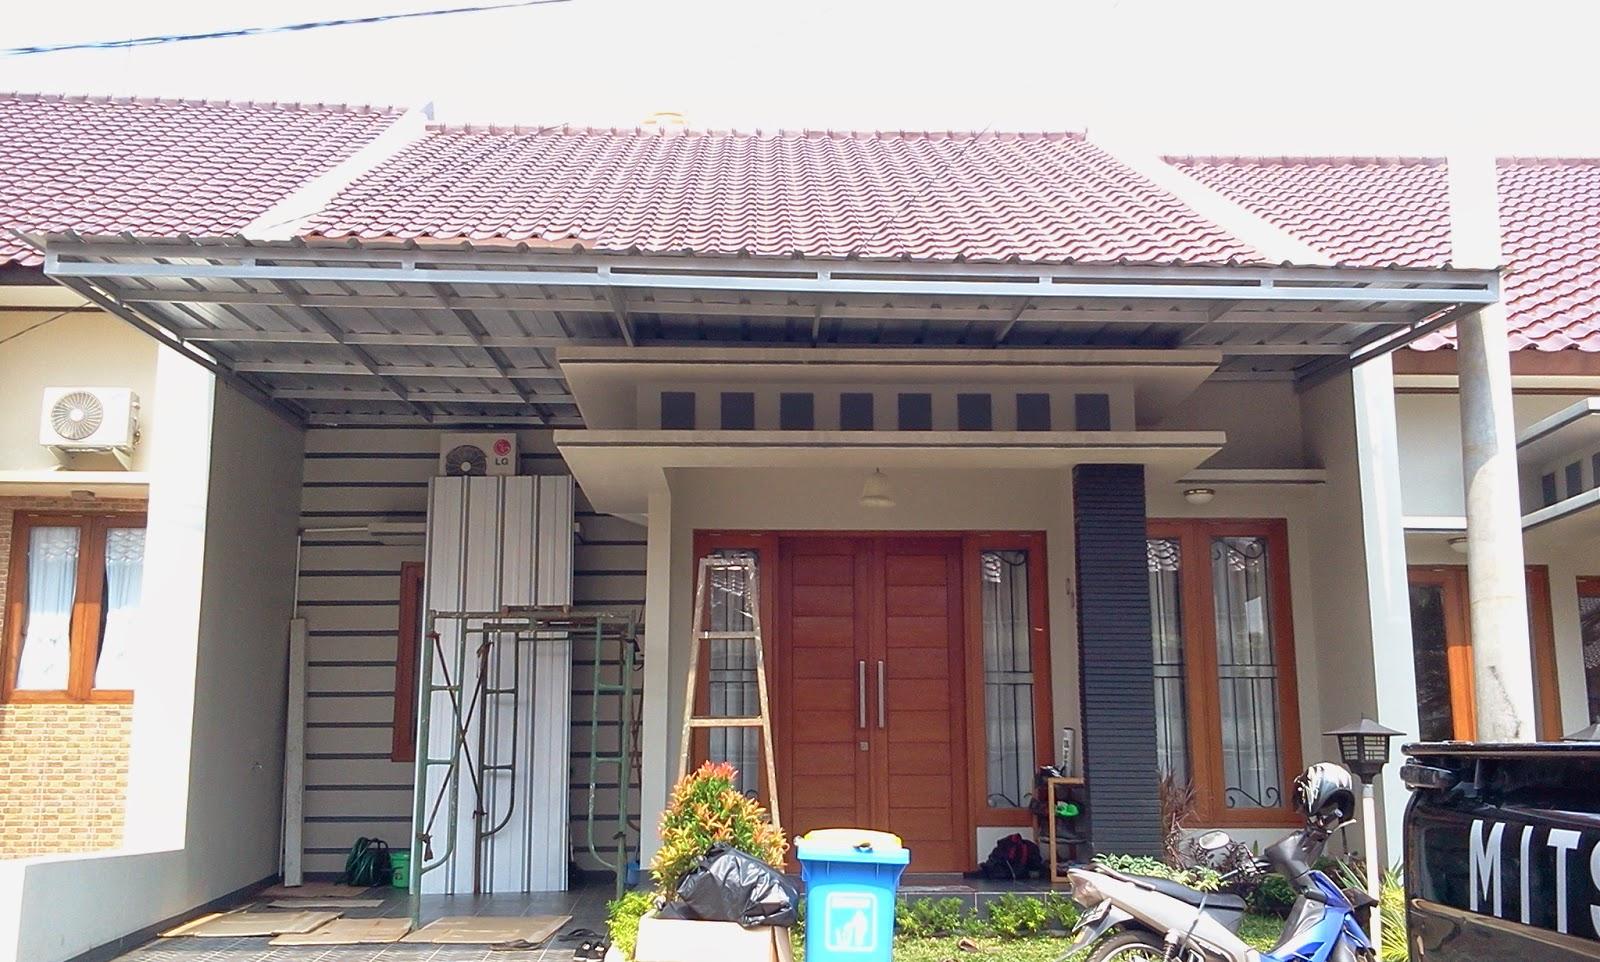 Bengkel Las Kanopi  Pagar Rolling Door di Malang Harga